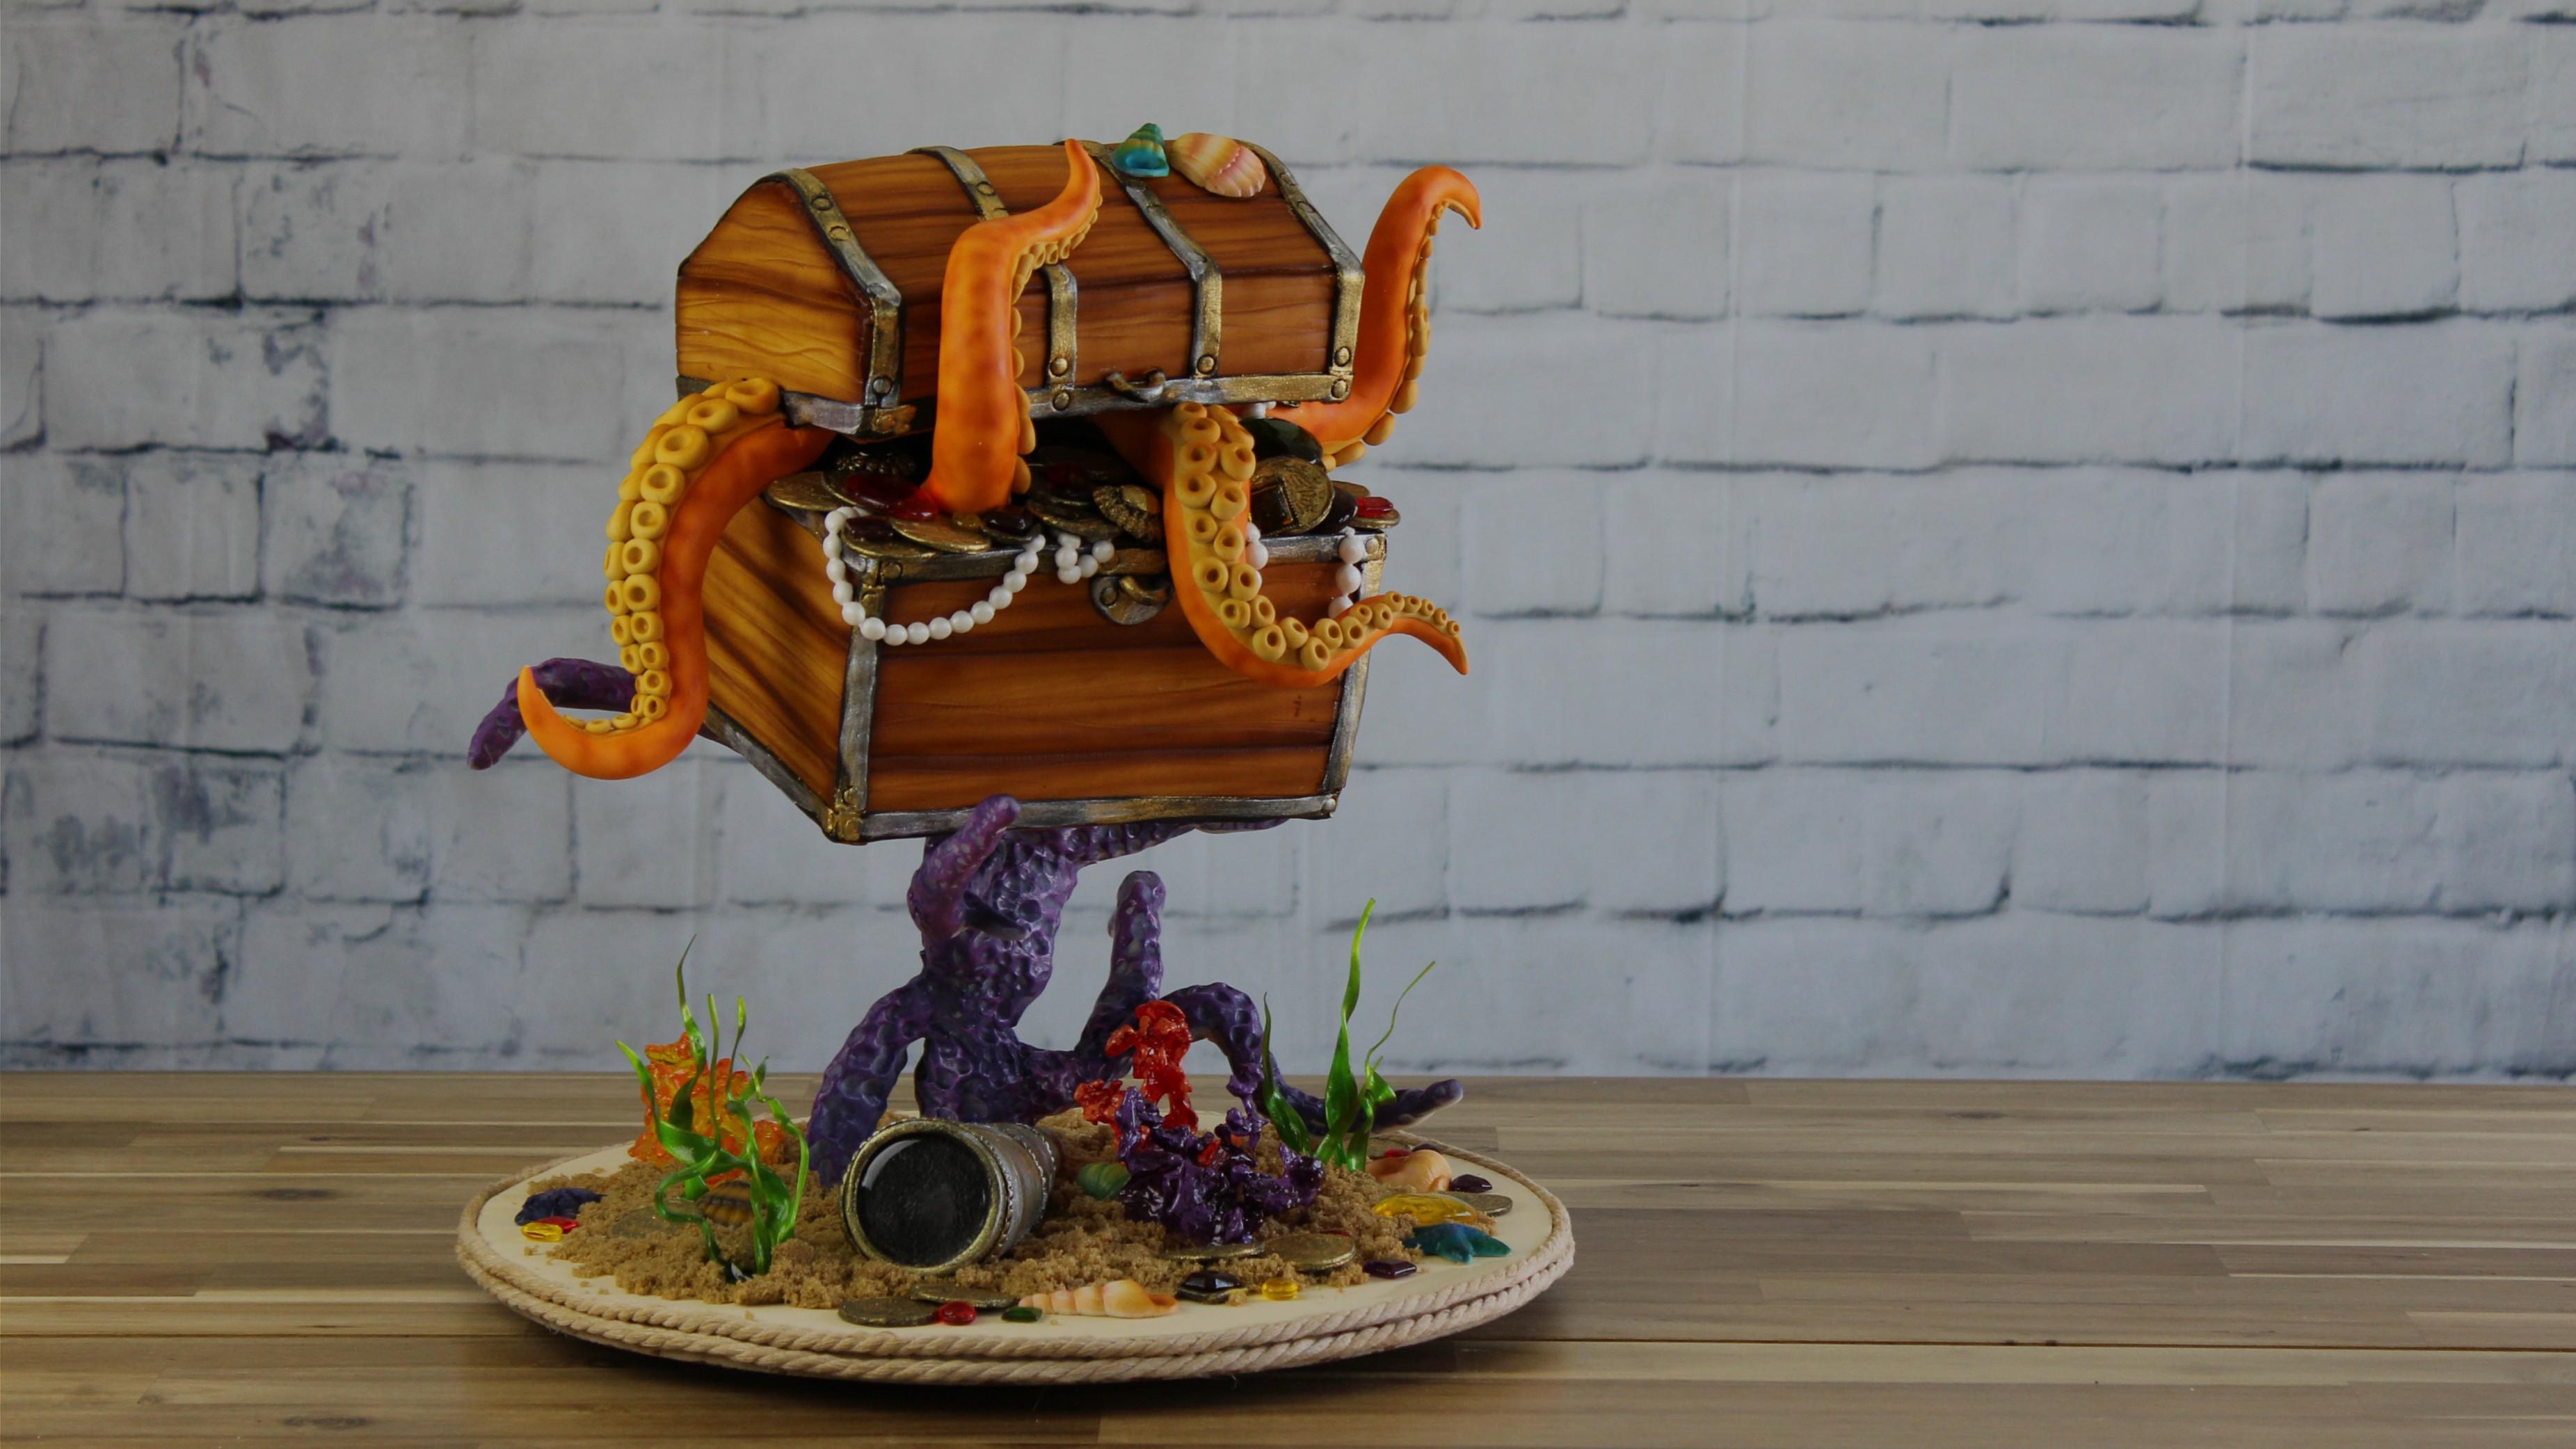 cours de cake design en ligne: trésor du kraken